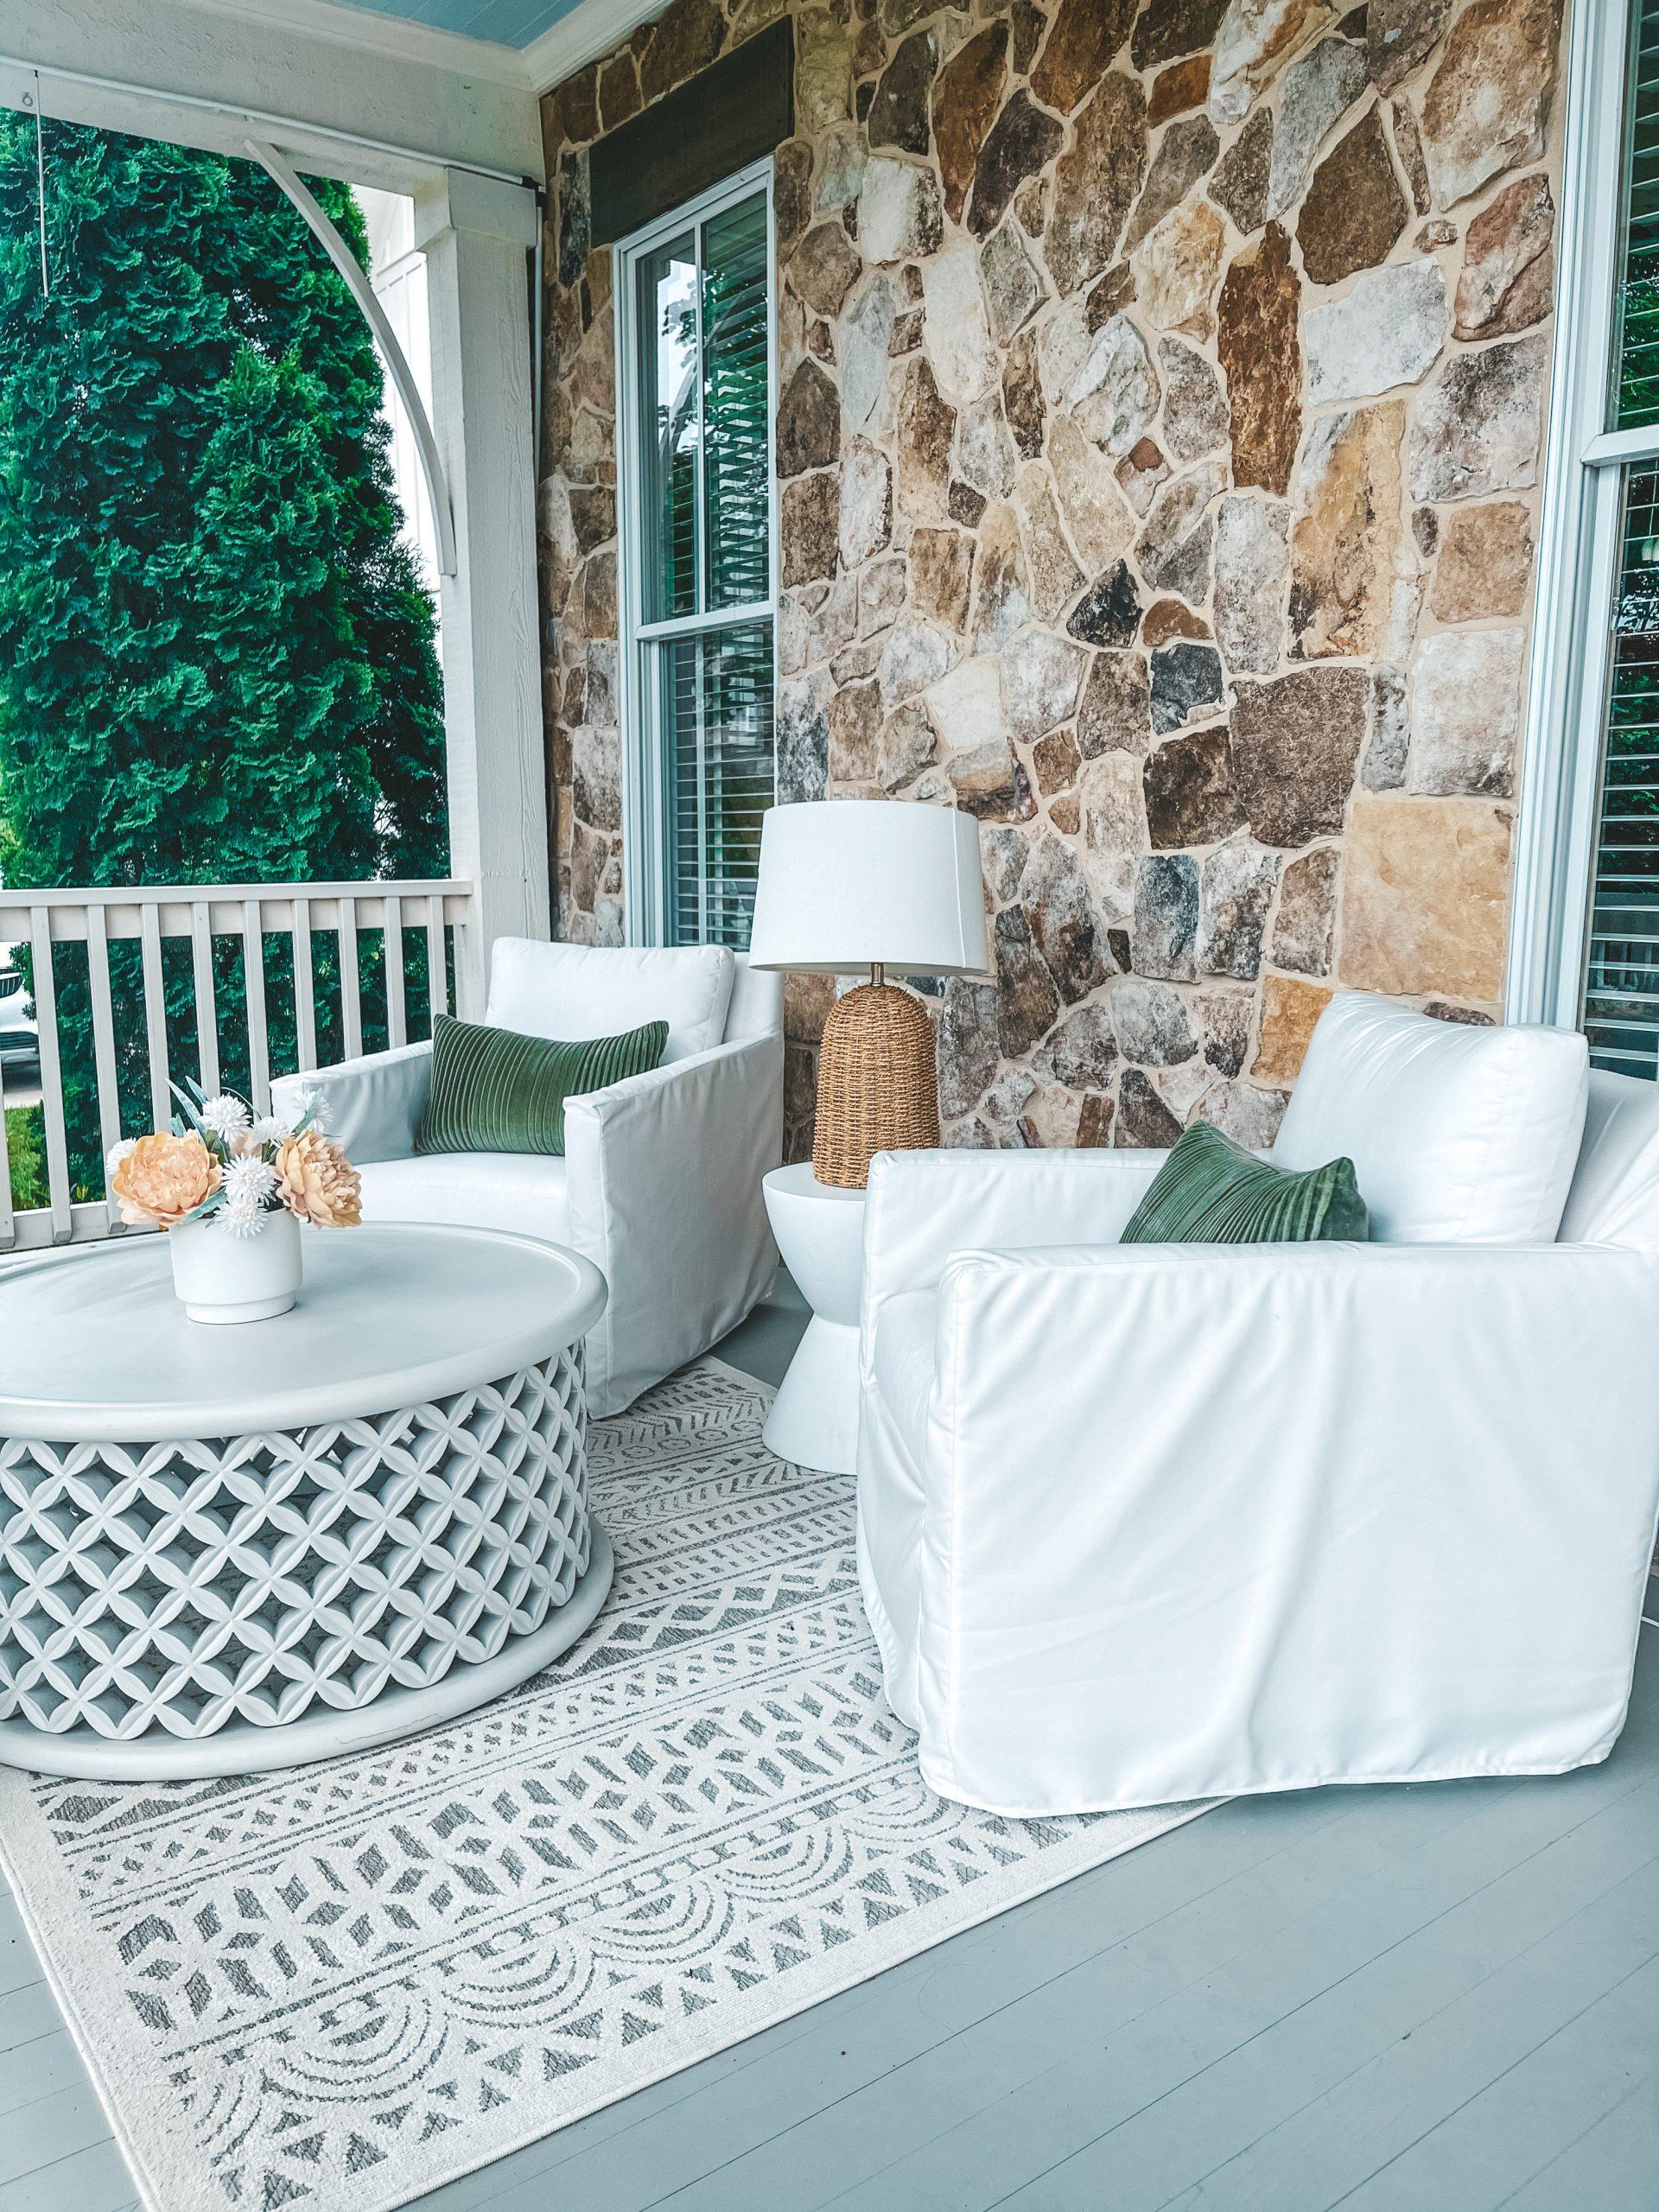 pottery bar Primave Indoor/Outdoor Rug - Light Blue patio decor angela lanter home